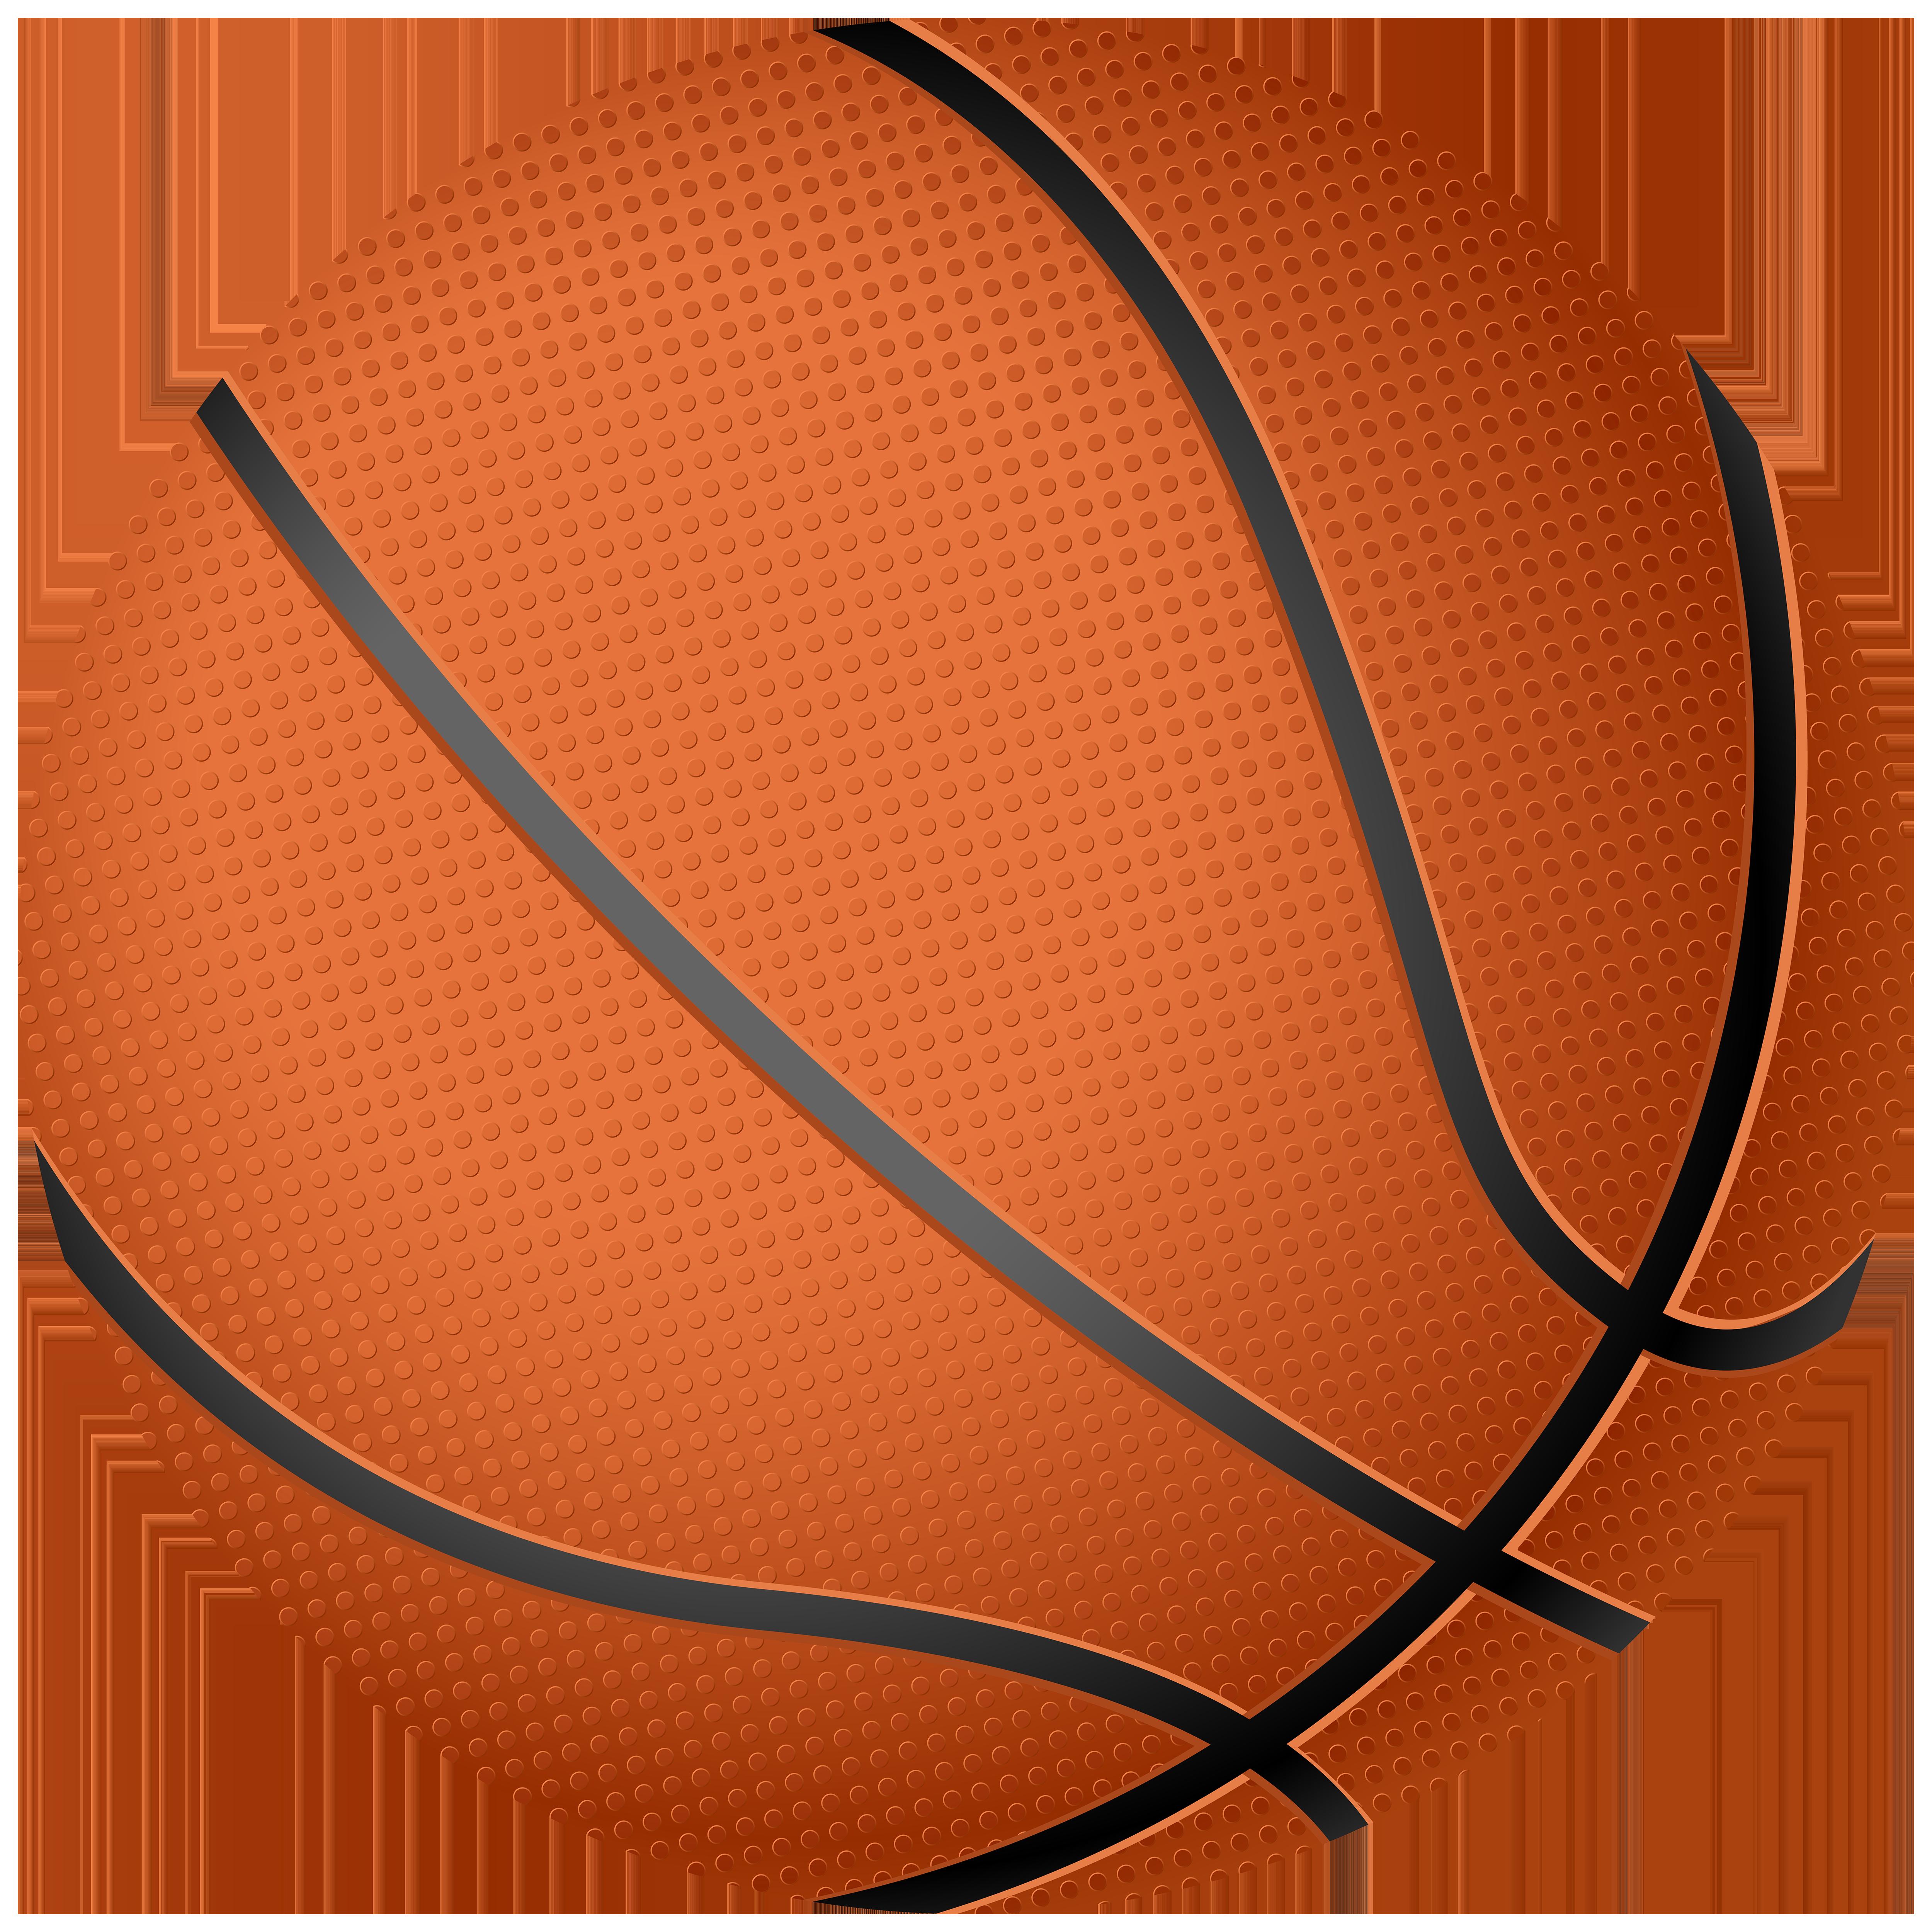 Hearts clipart basketball. Png clip art best